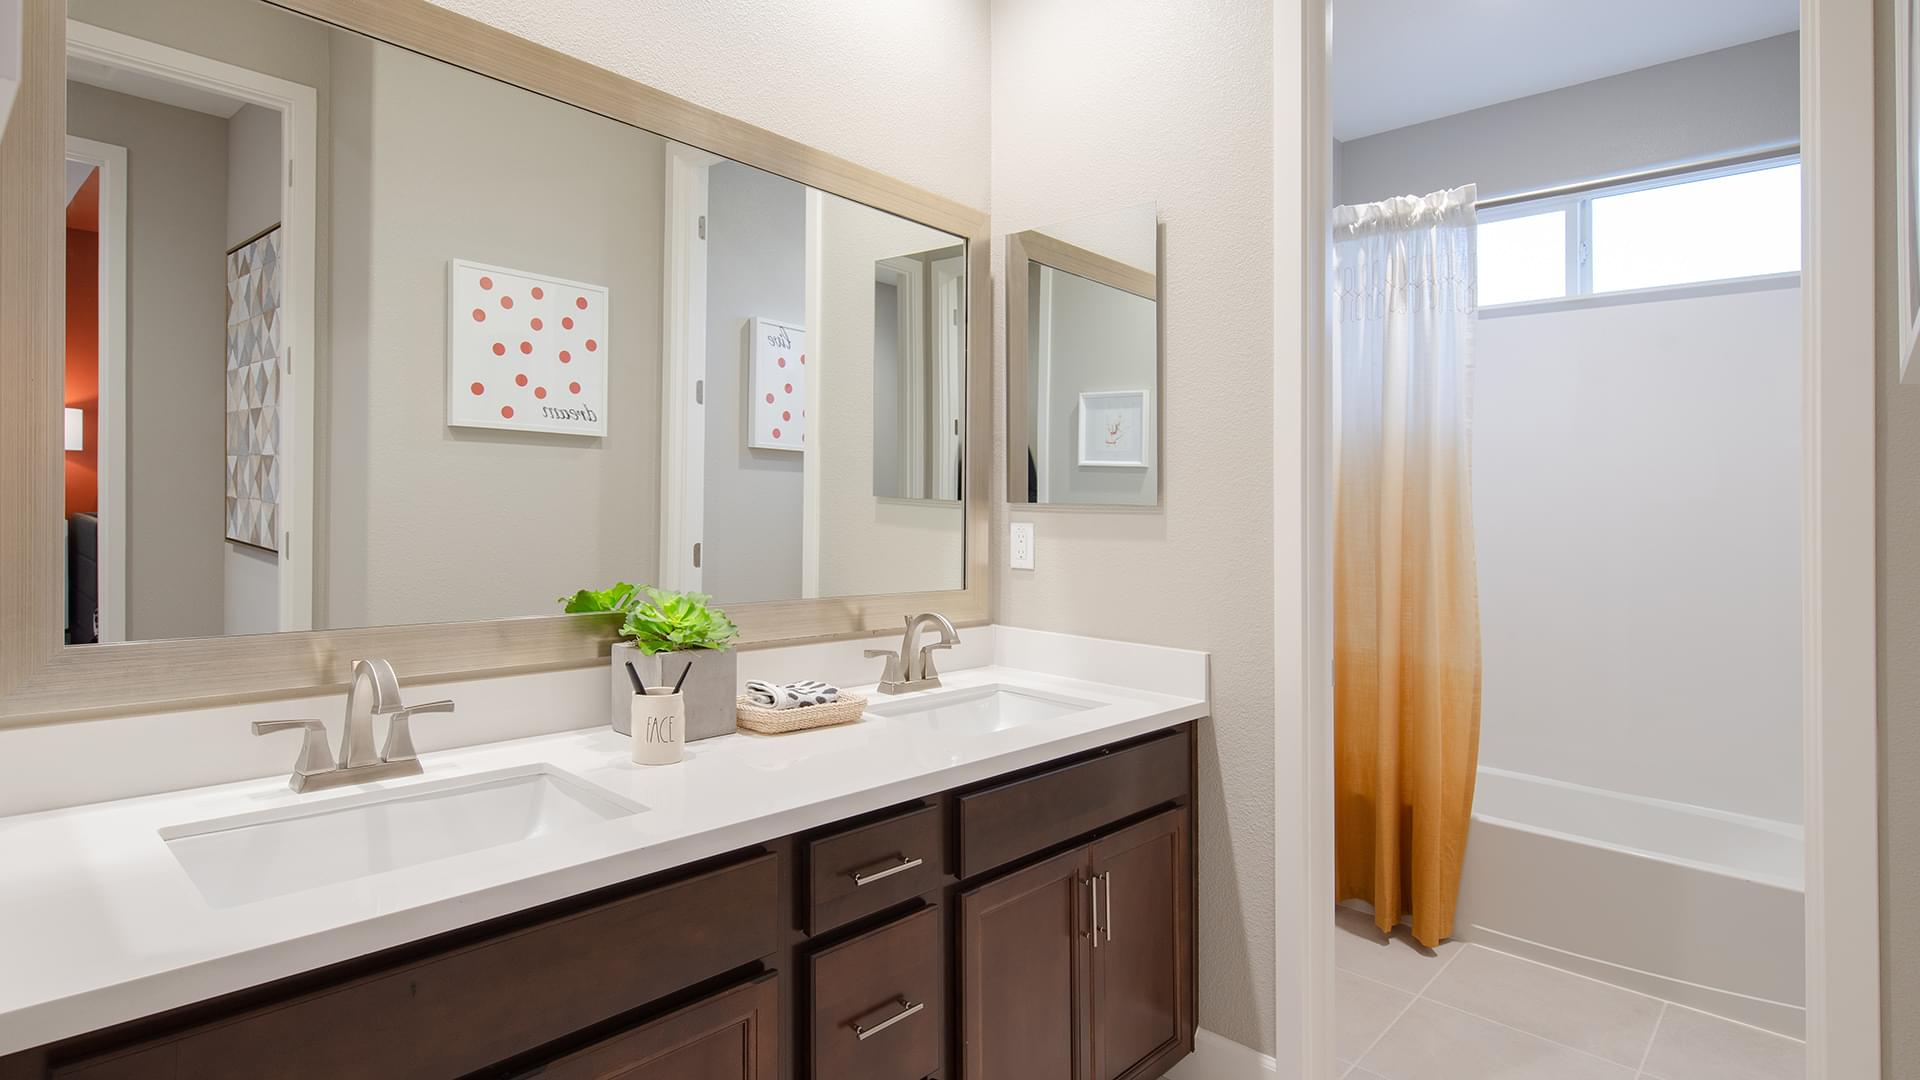 Residence 5 Bath 2